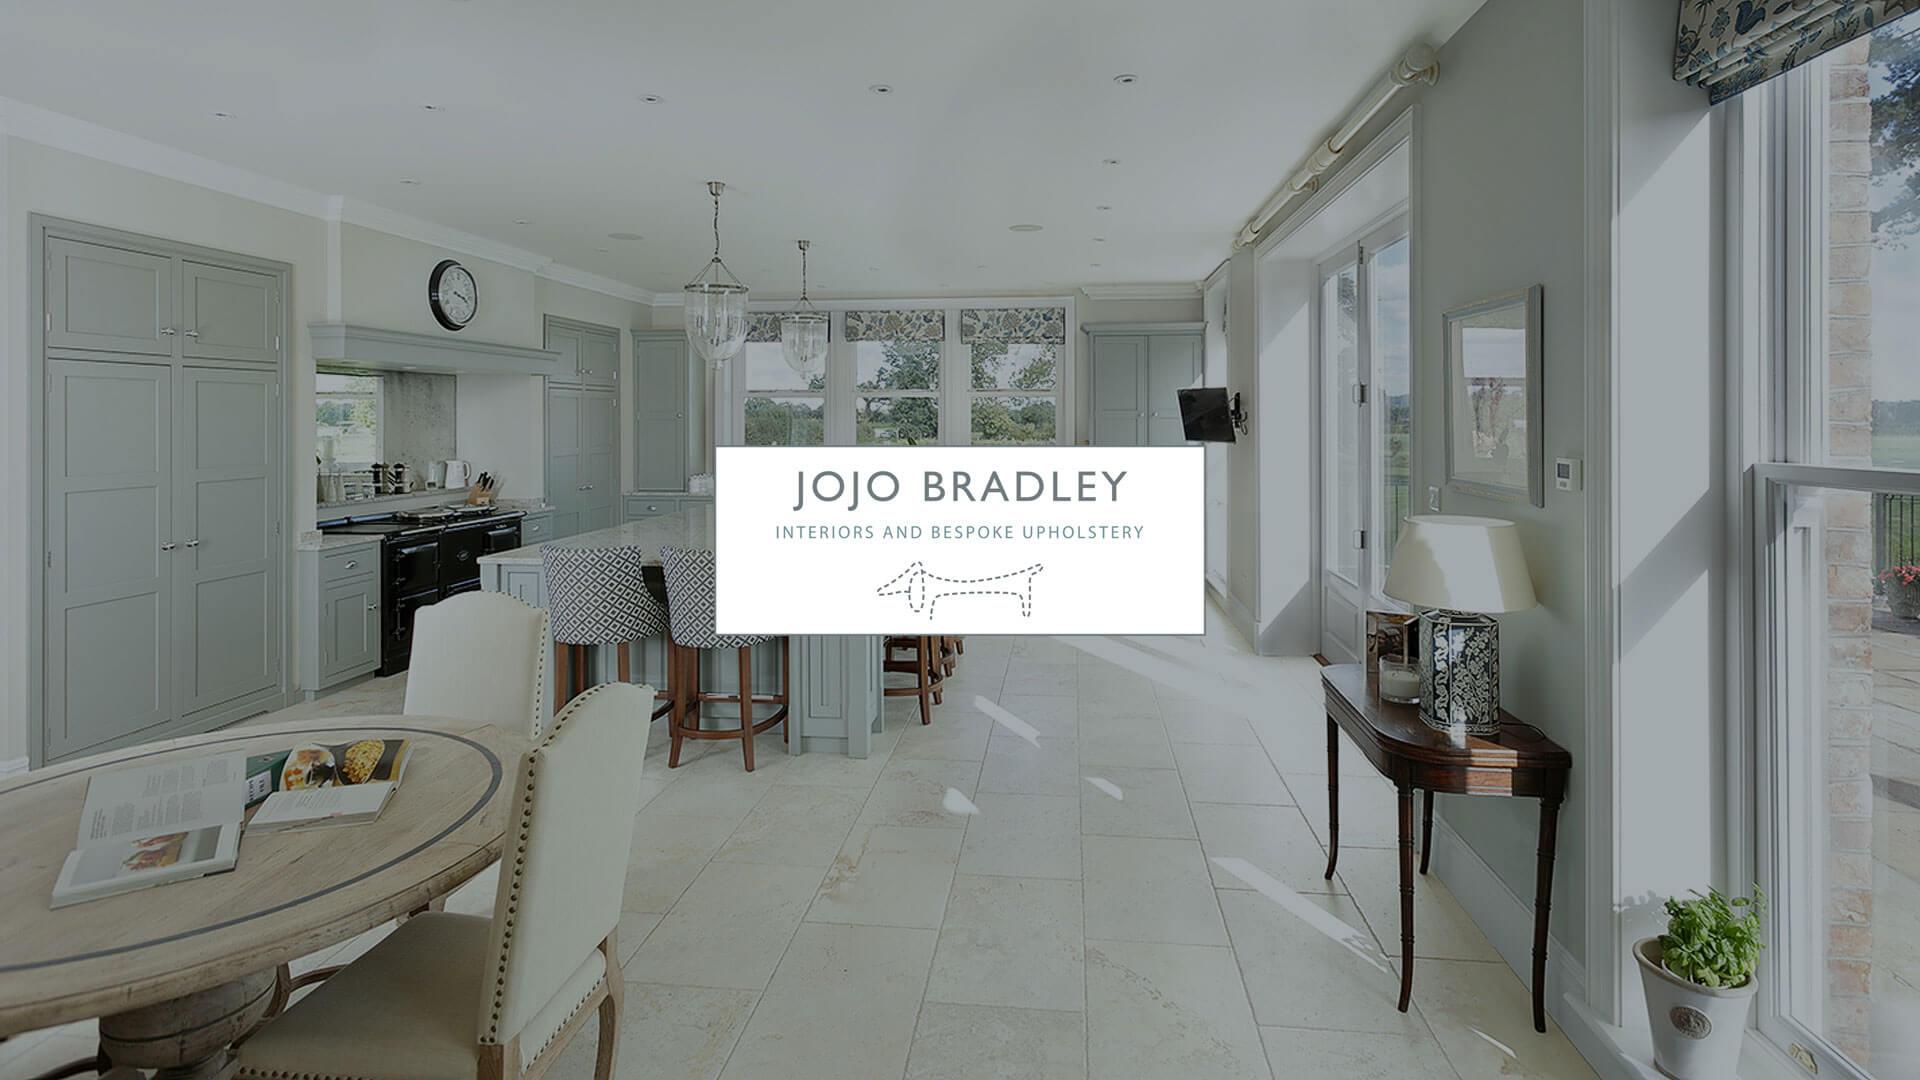 Jojo Bradley Interiors